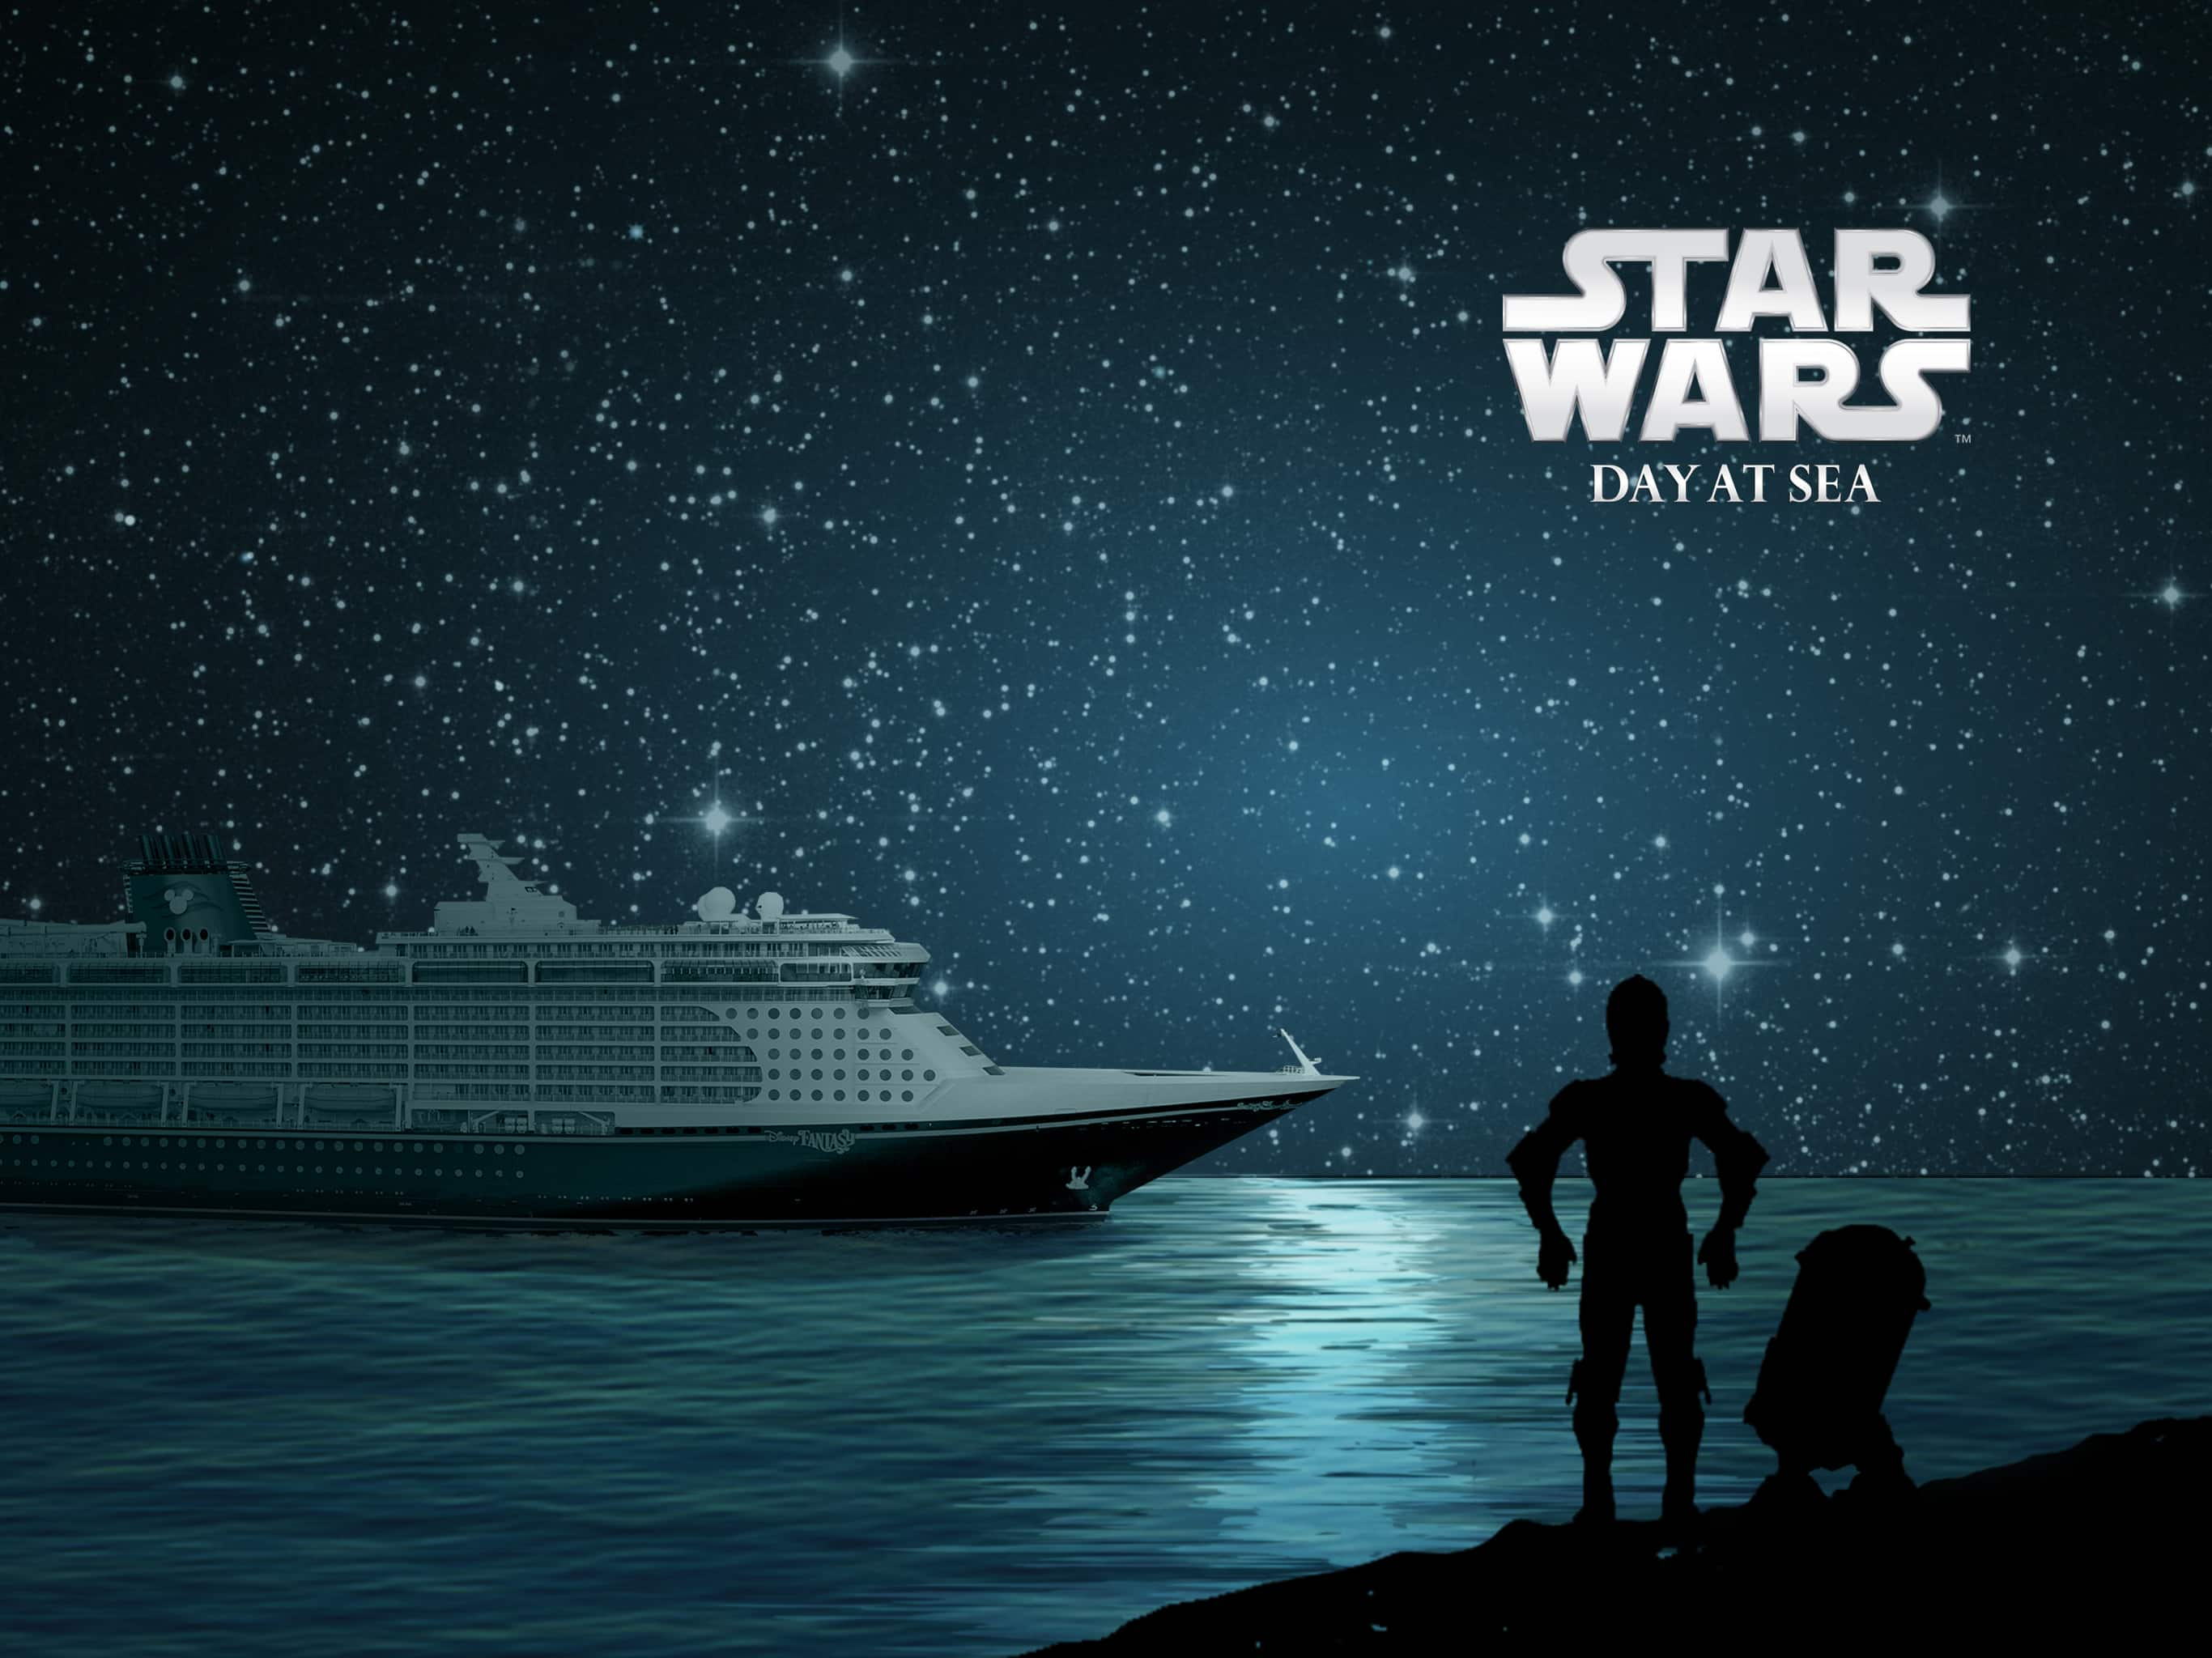 2020 Star Wars Day At Sea Wallpaper Desktop Ipad Disney Parks Blog